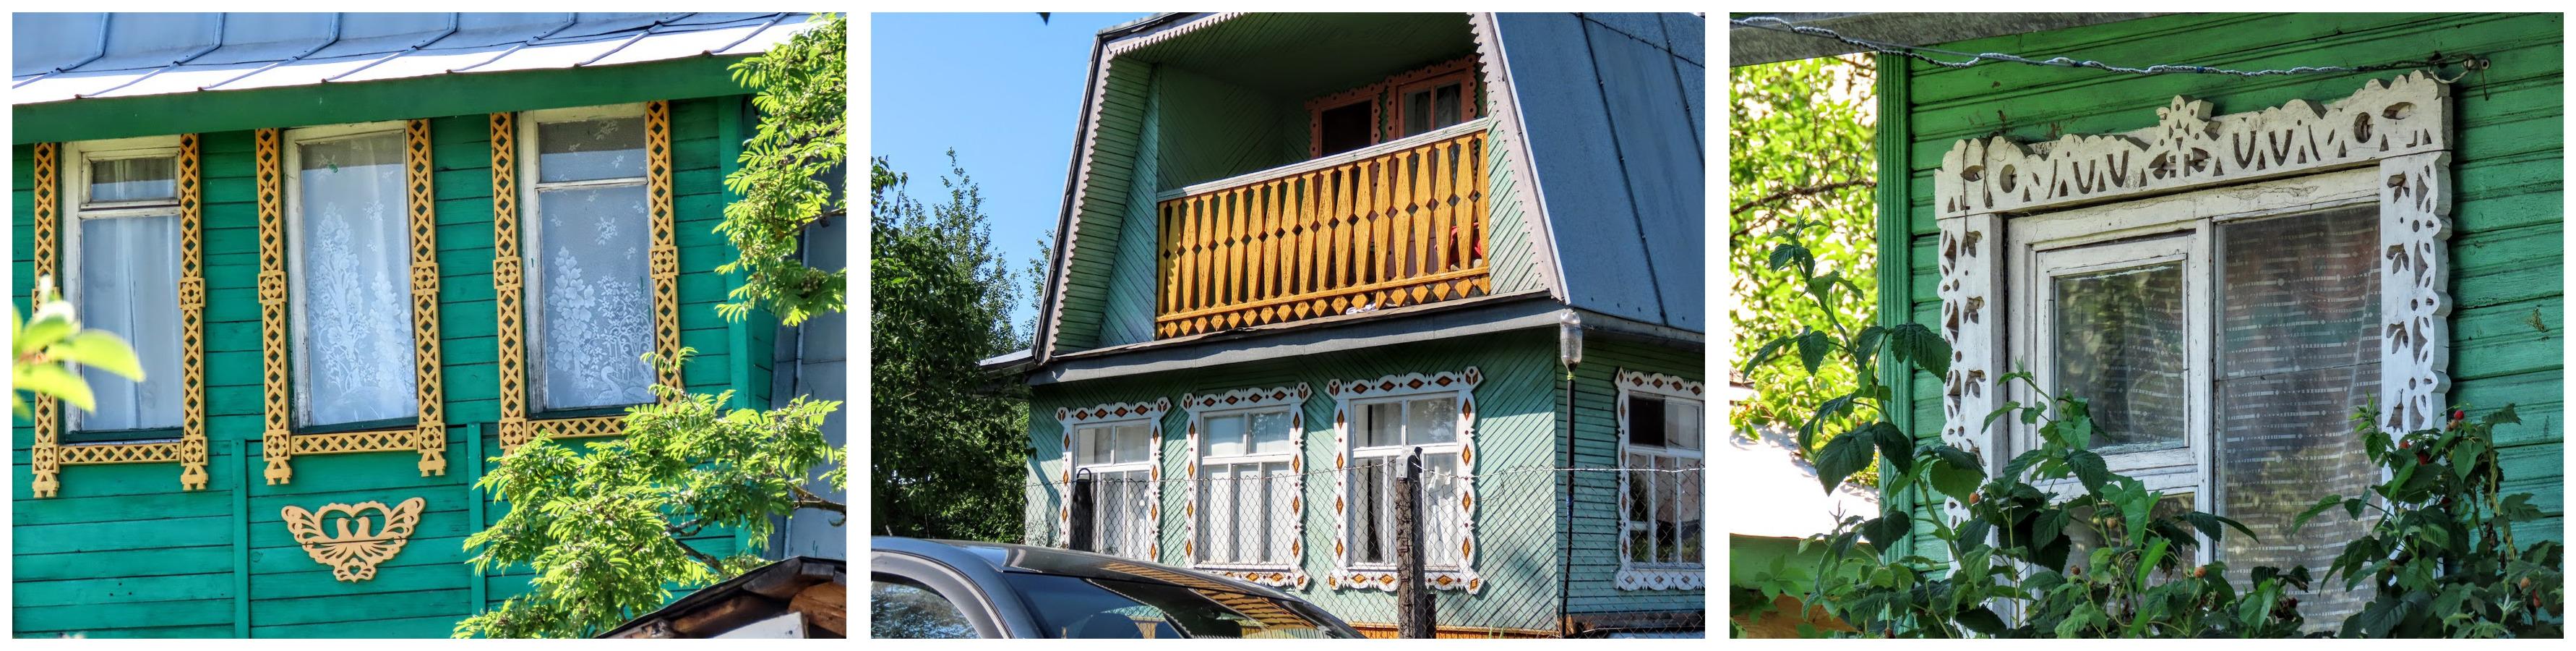 imgonline-com-ua-Collage-86c2c43-Snat9i